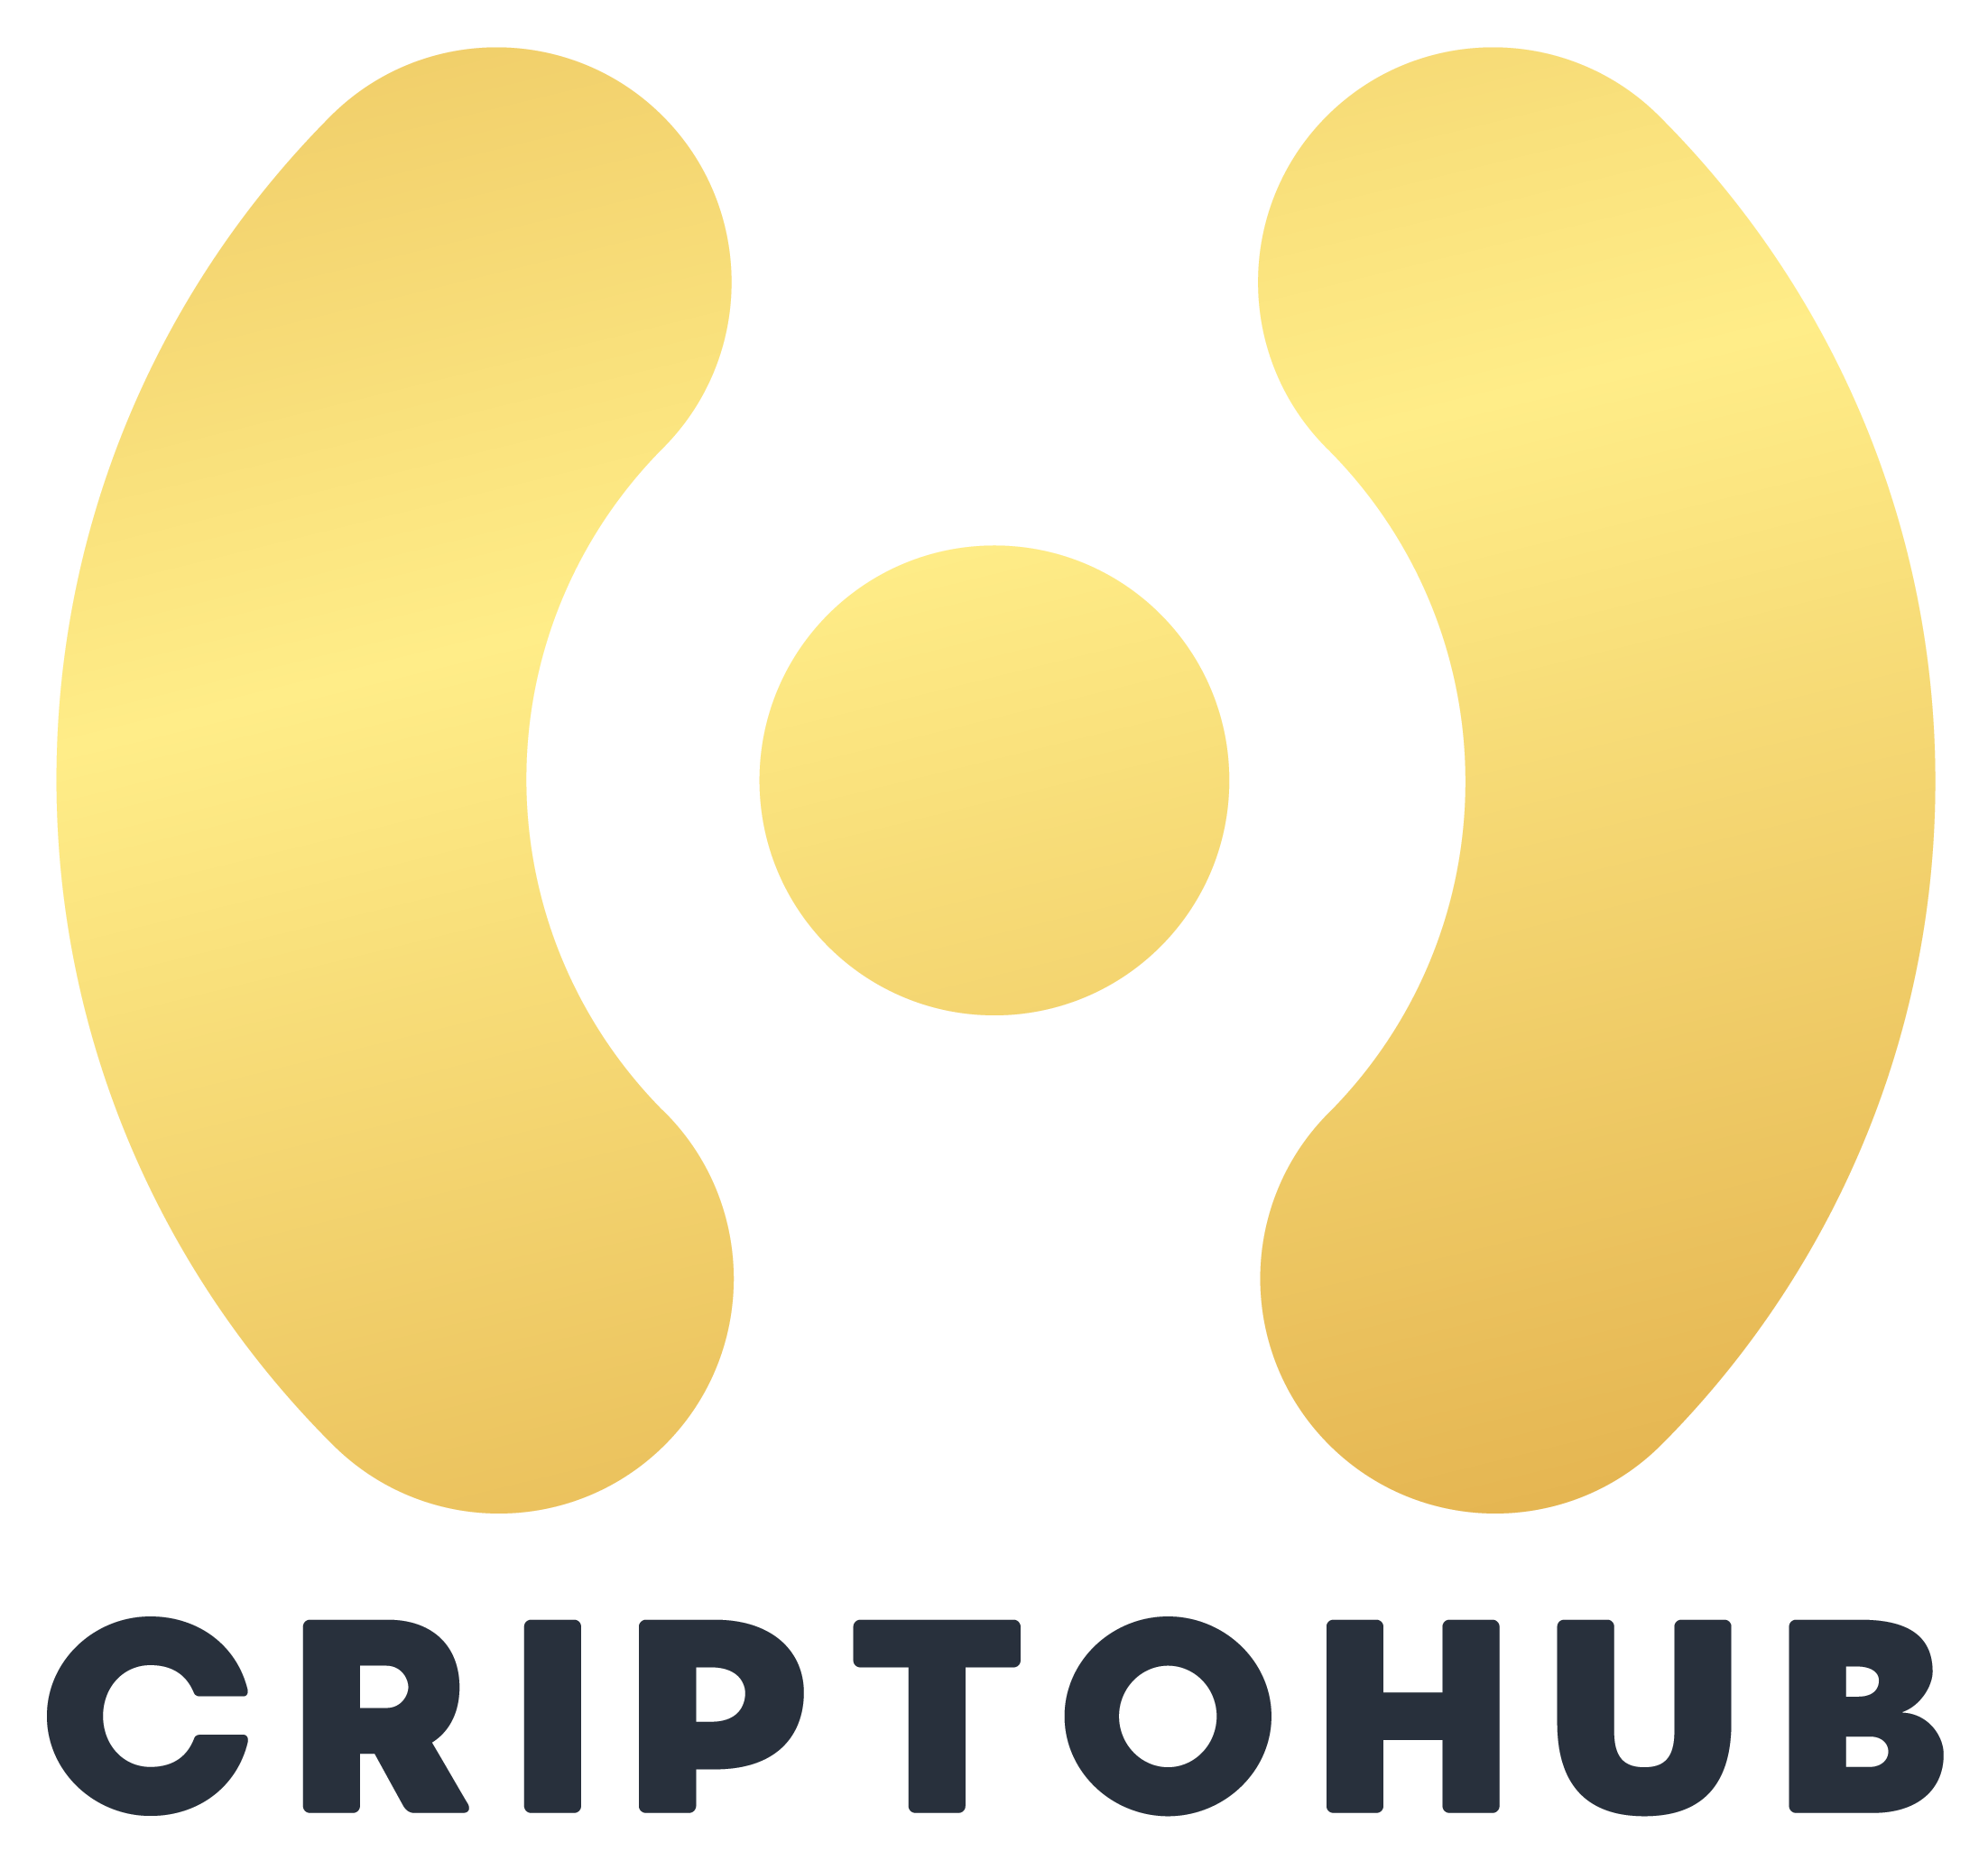 Criptohub